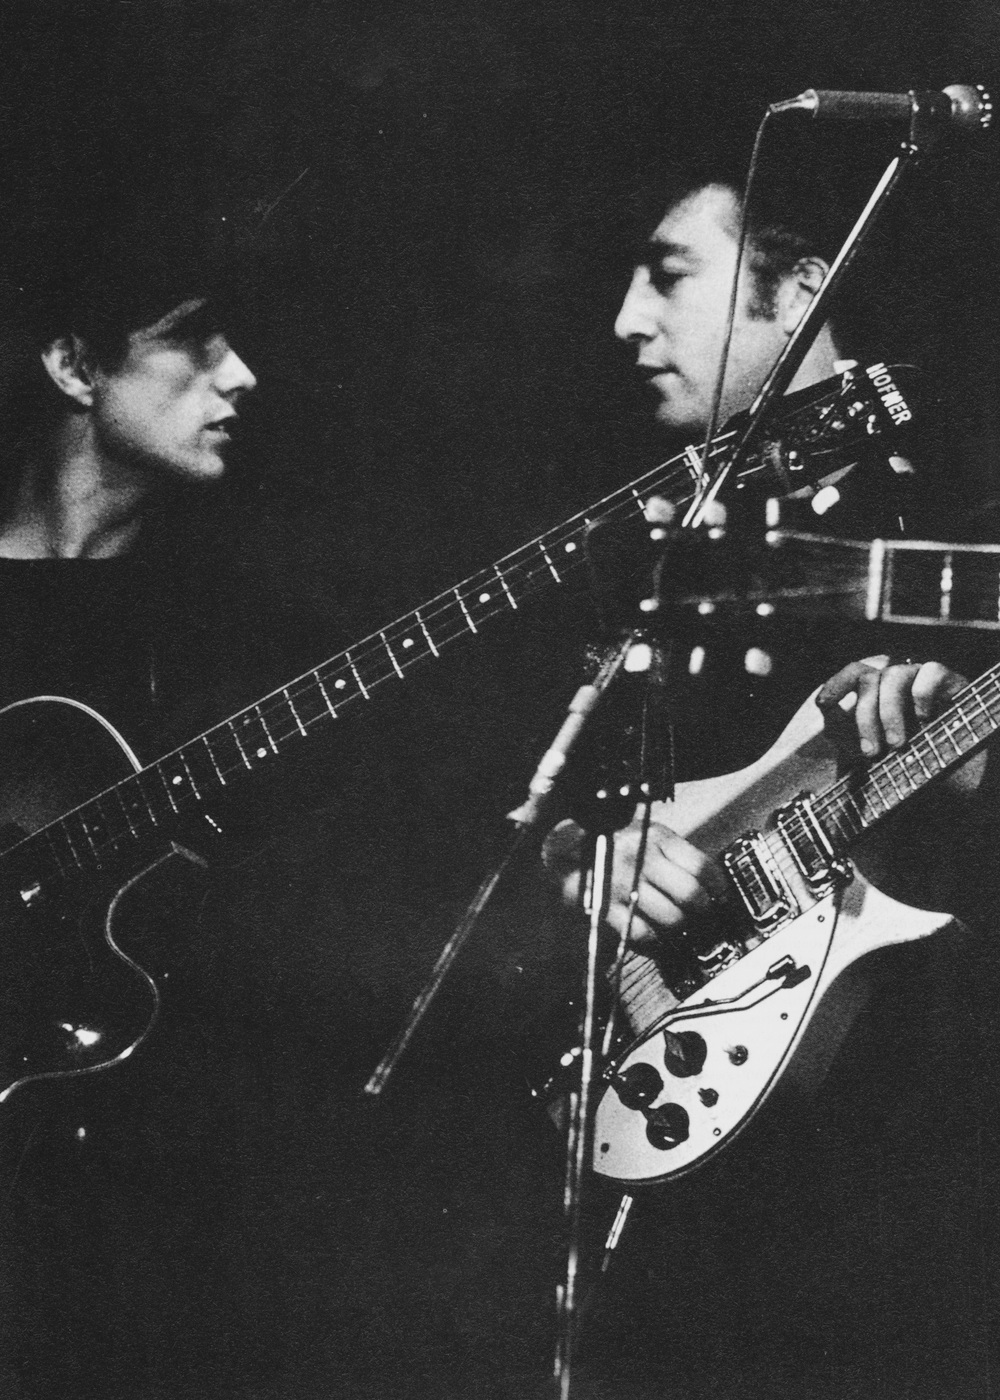 John Lennon and Stuart Sutcliffe in Hamburg, 1960.